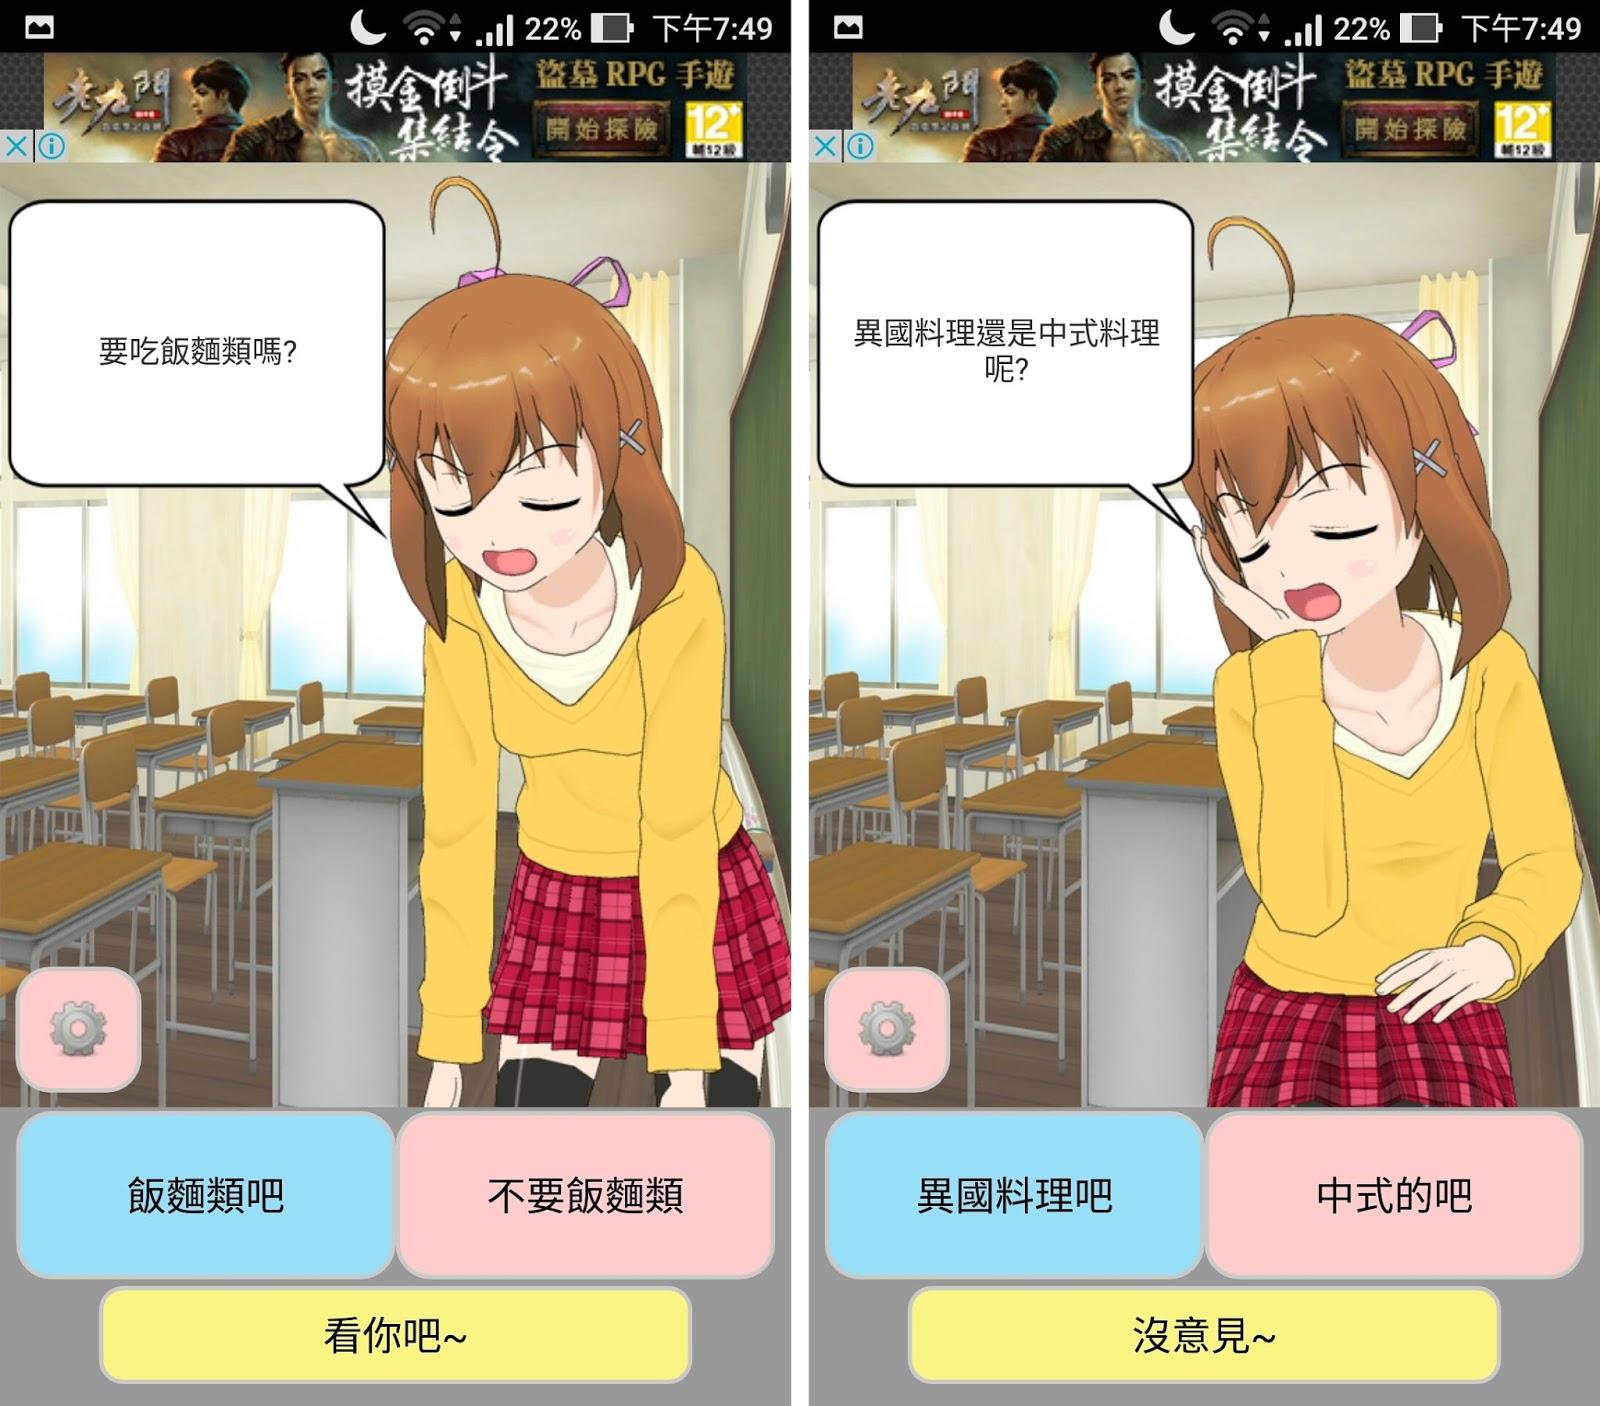 Screenshot 20170422 194904 - 「等下吃什麼?」總是猶豫不決,就讓虛擬女友幫你決定!